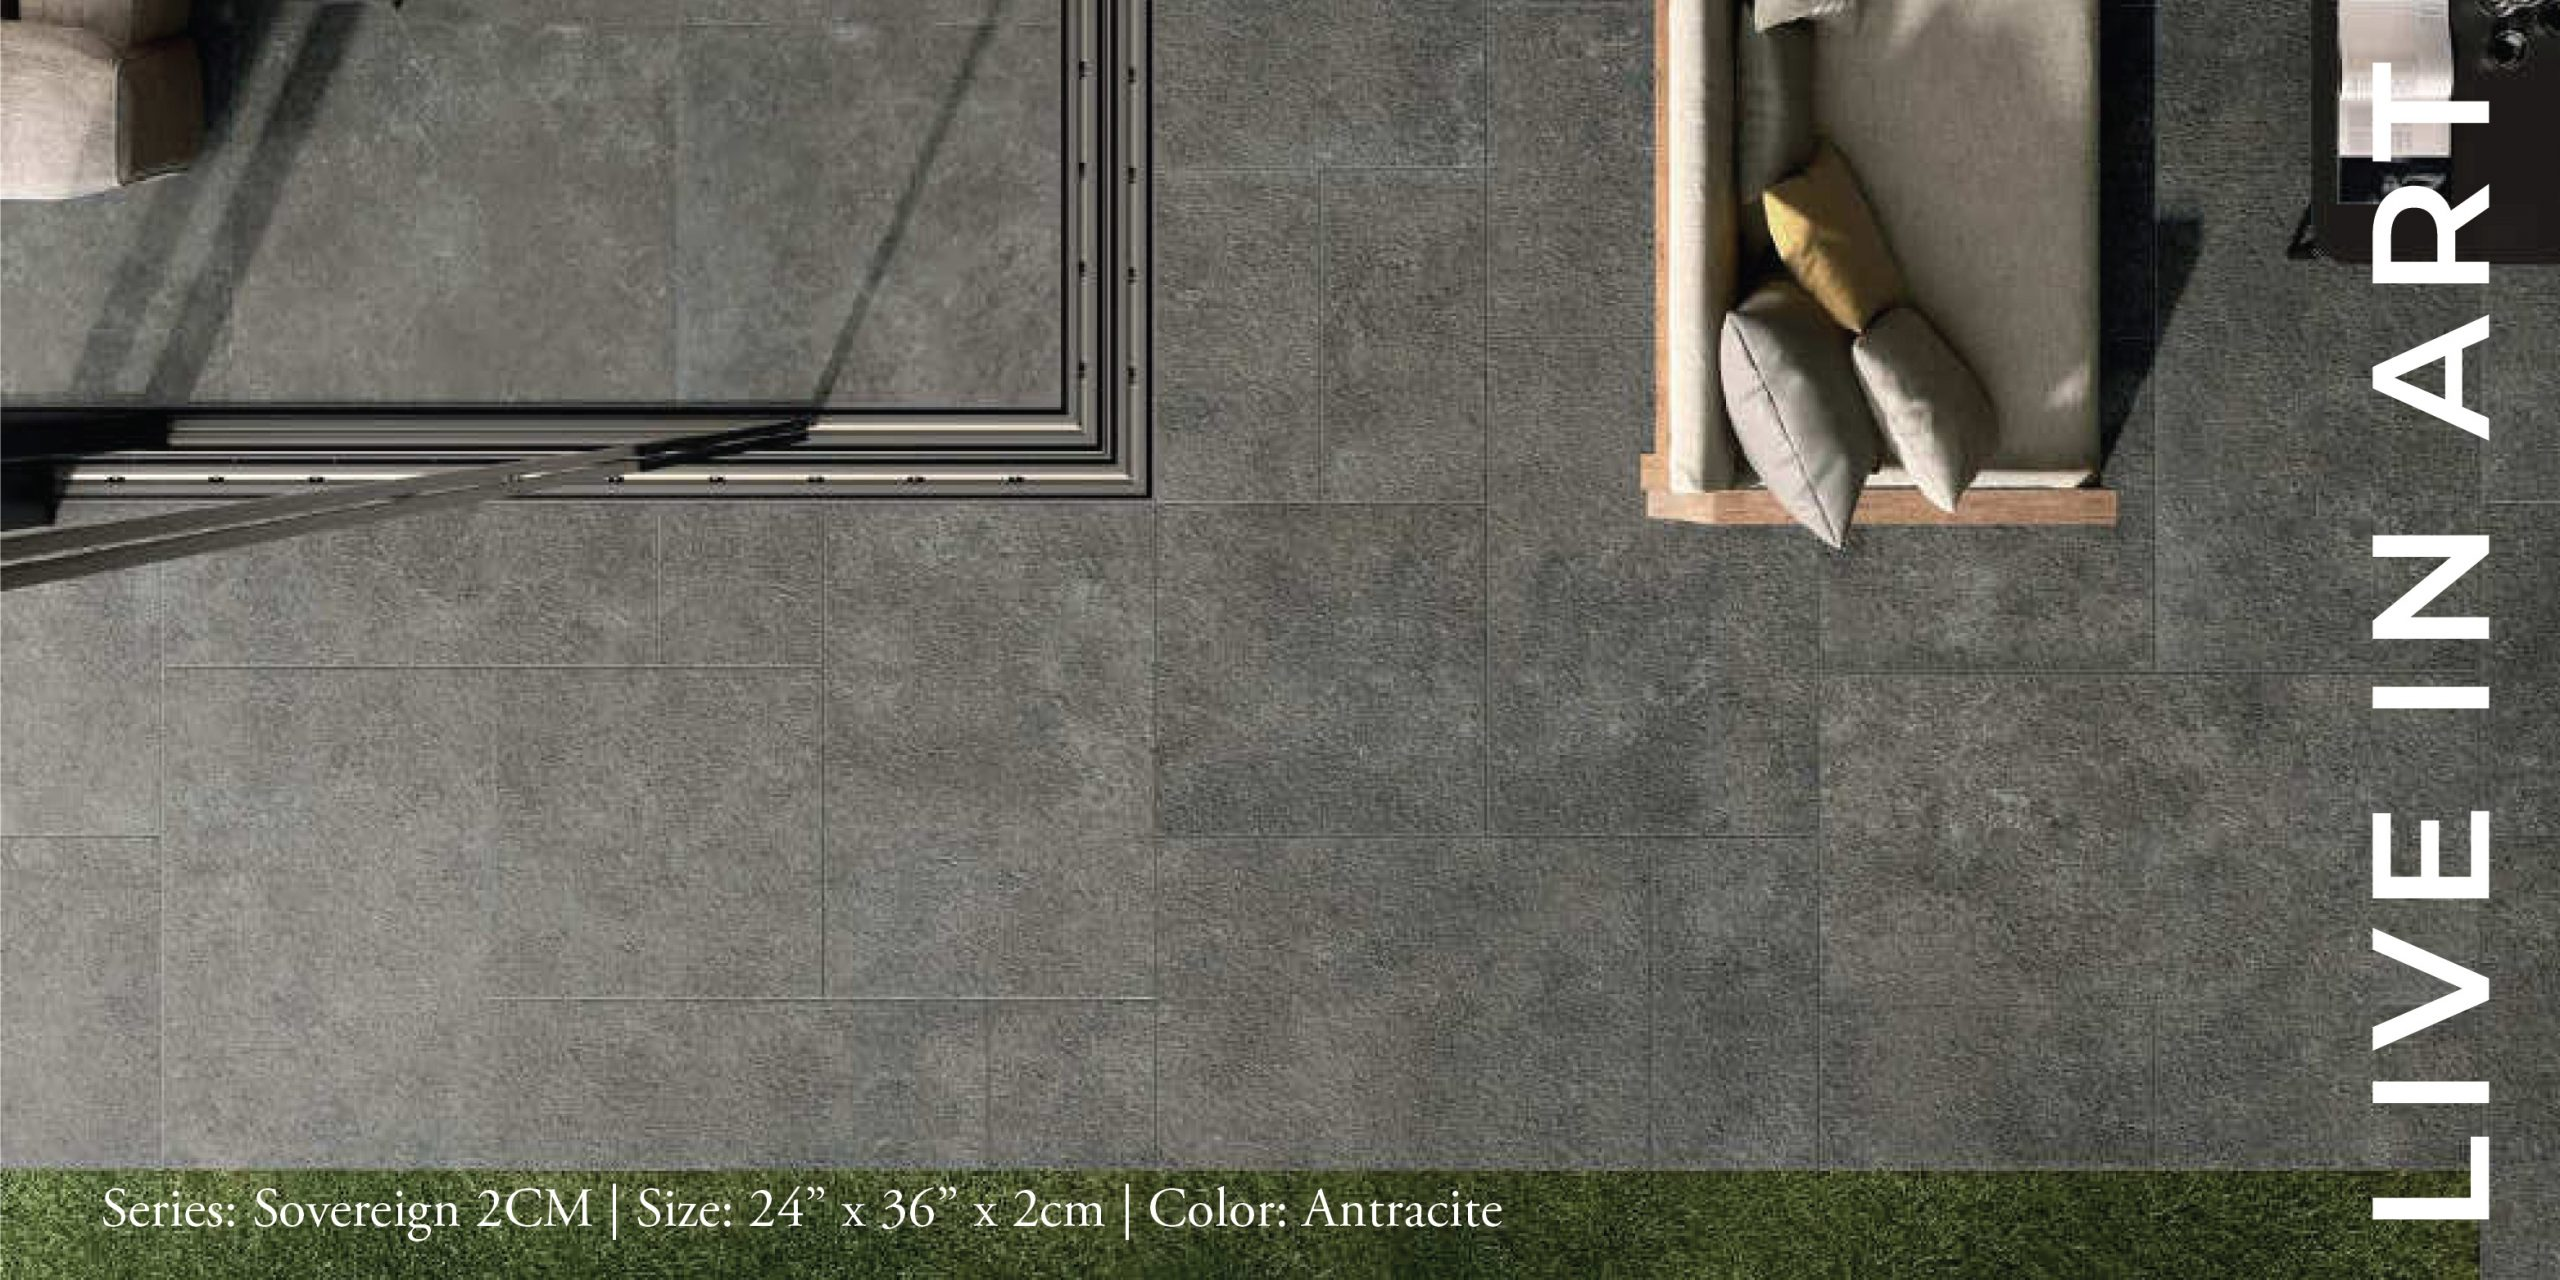 Sovereign Antracite 24x36